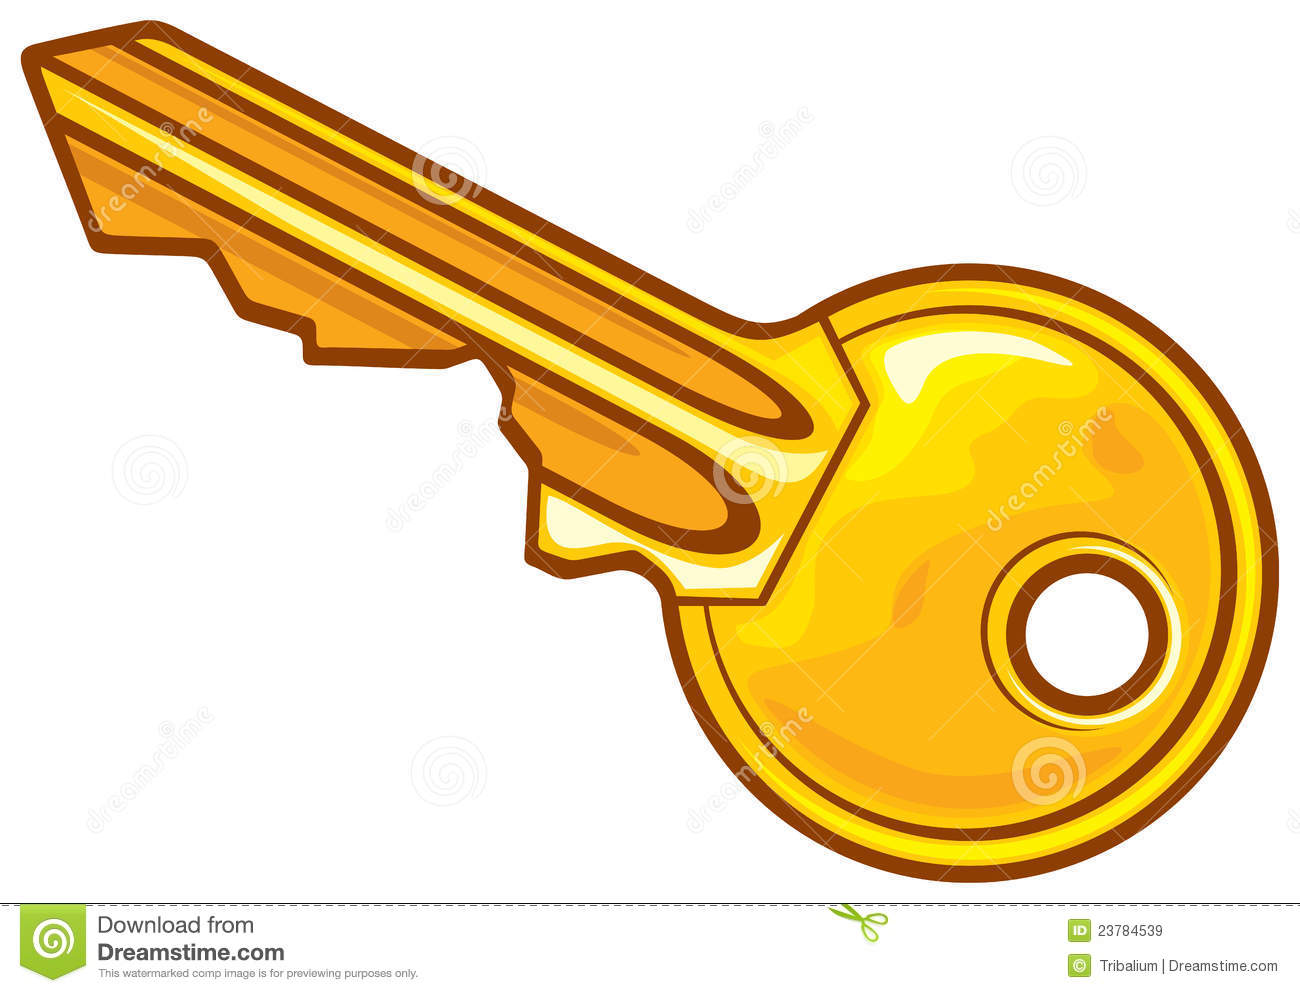 Llave clipart png transparent Key clipart llave - 127 transparent clip arts, images and pictures ... png transparent